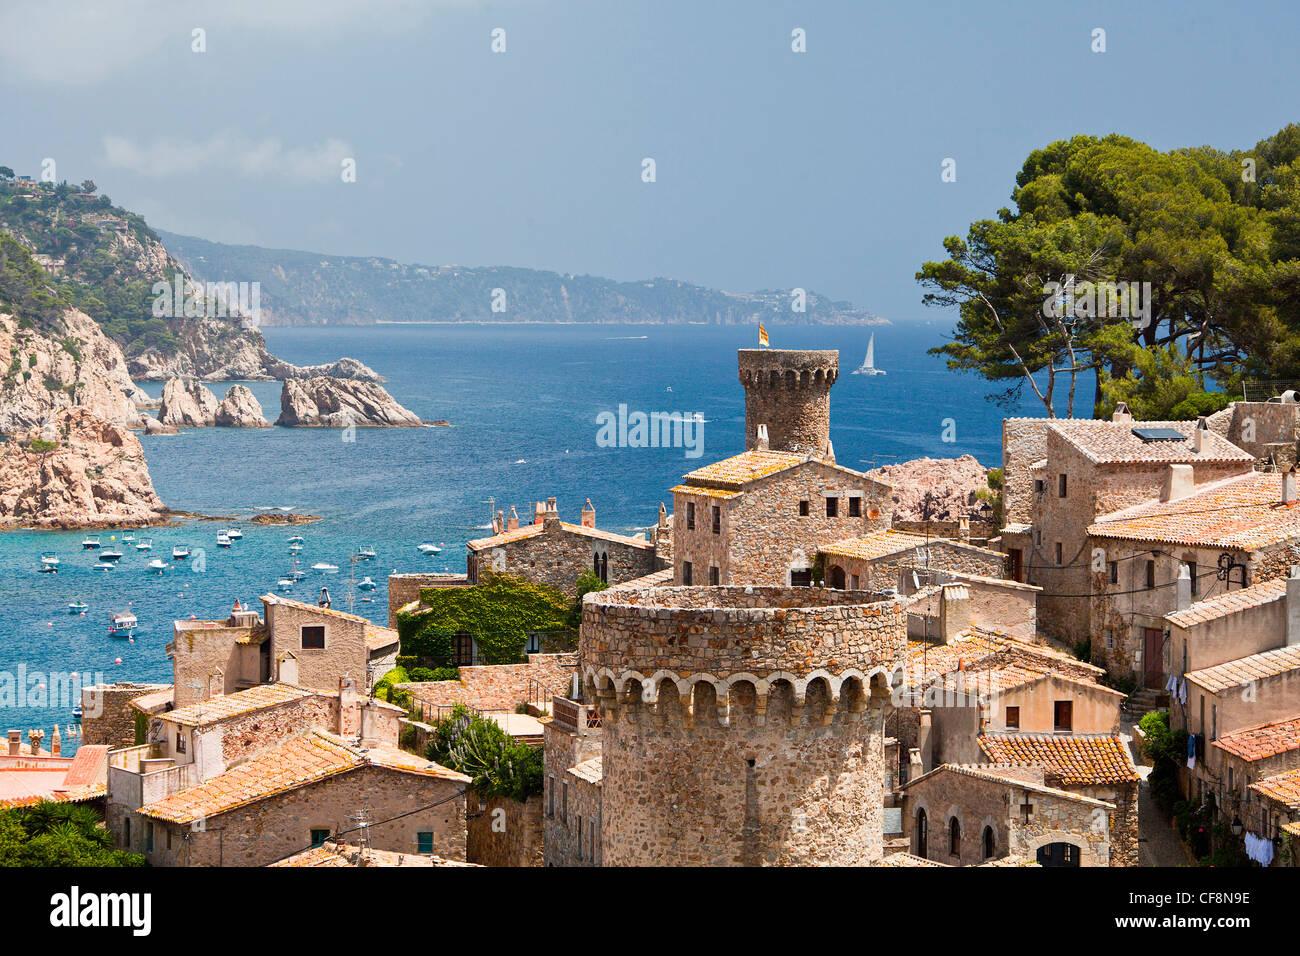 Spain europe girona province costa brava coast tossa de mar stock photo 43832922 alamy - Casco antiguo de girona ...